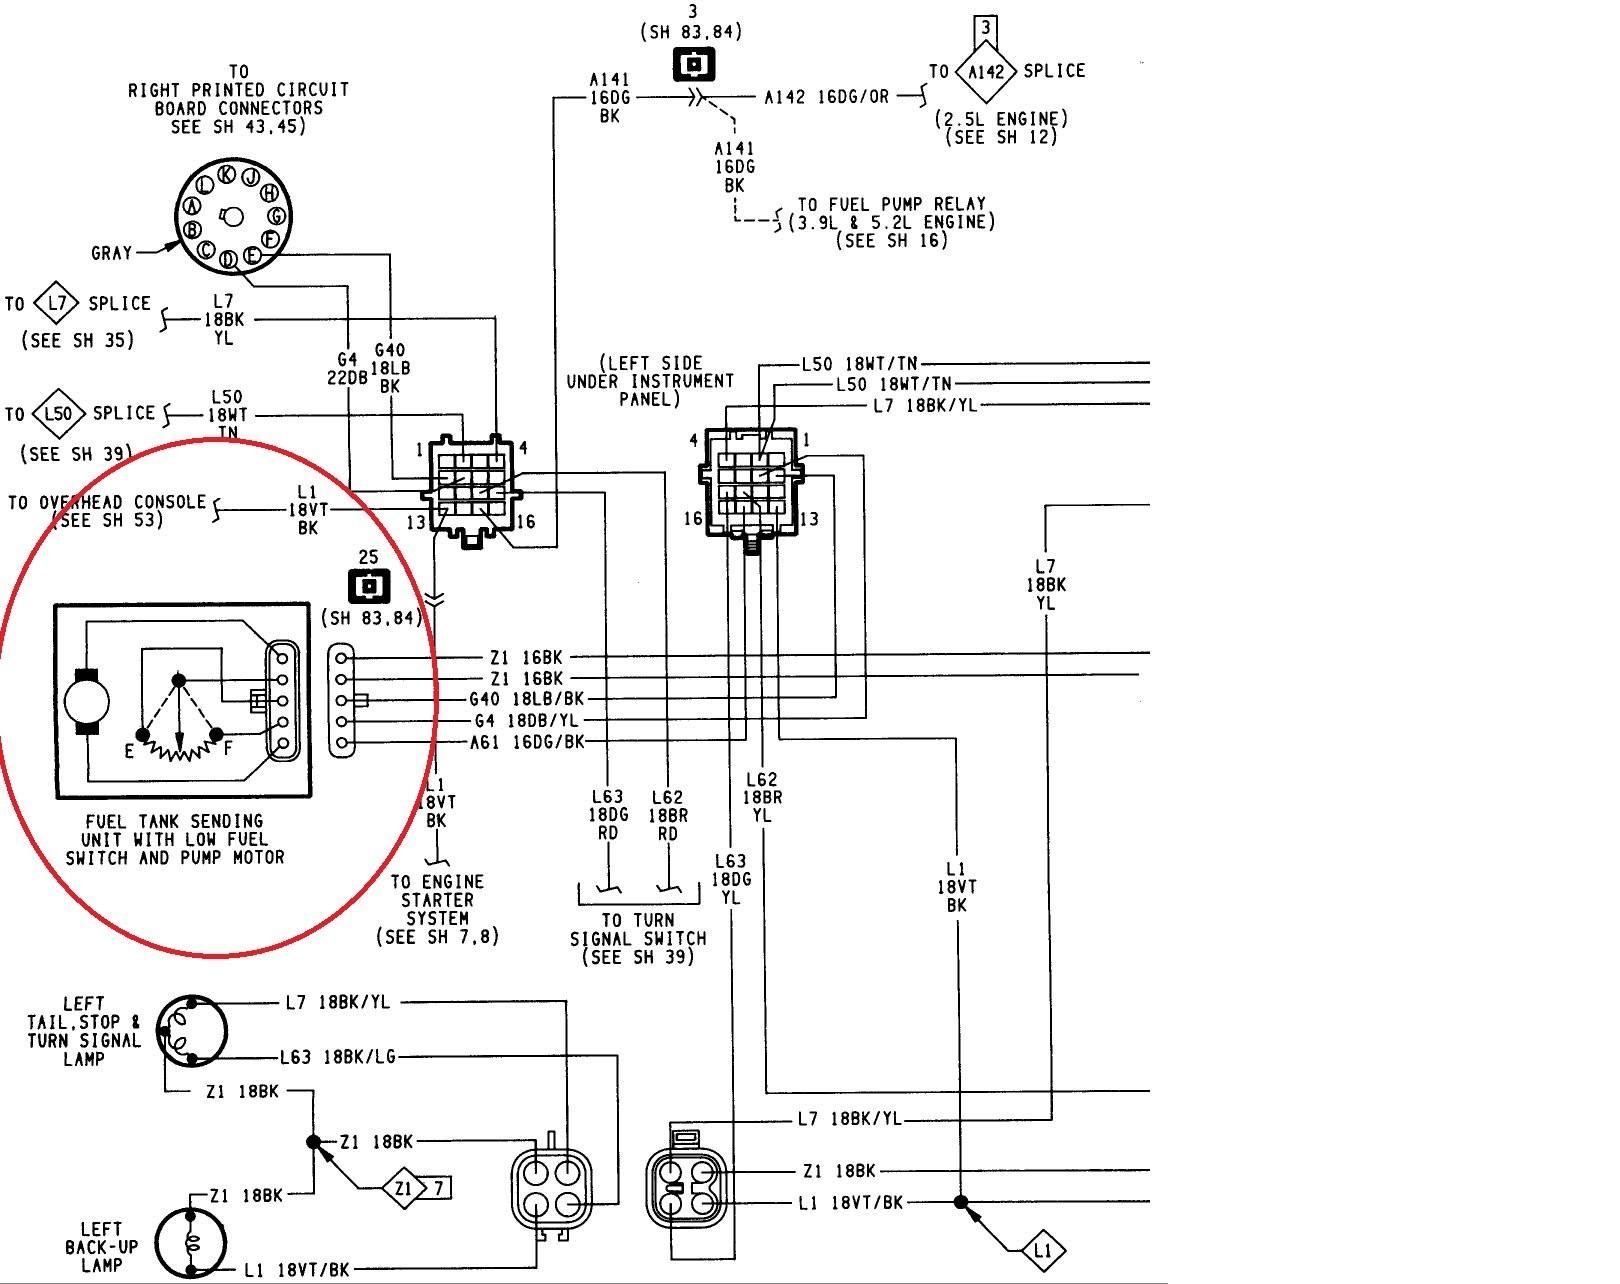 wiring a dual schematic wiring diagram toolboxdual wiring diagram wiring diagram datasource 87 chevy dual tank